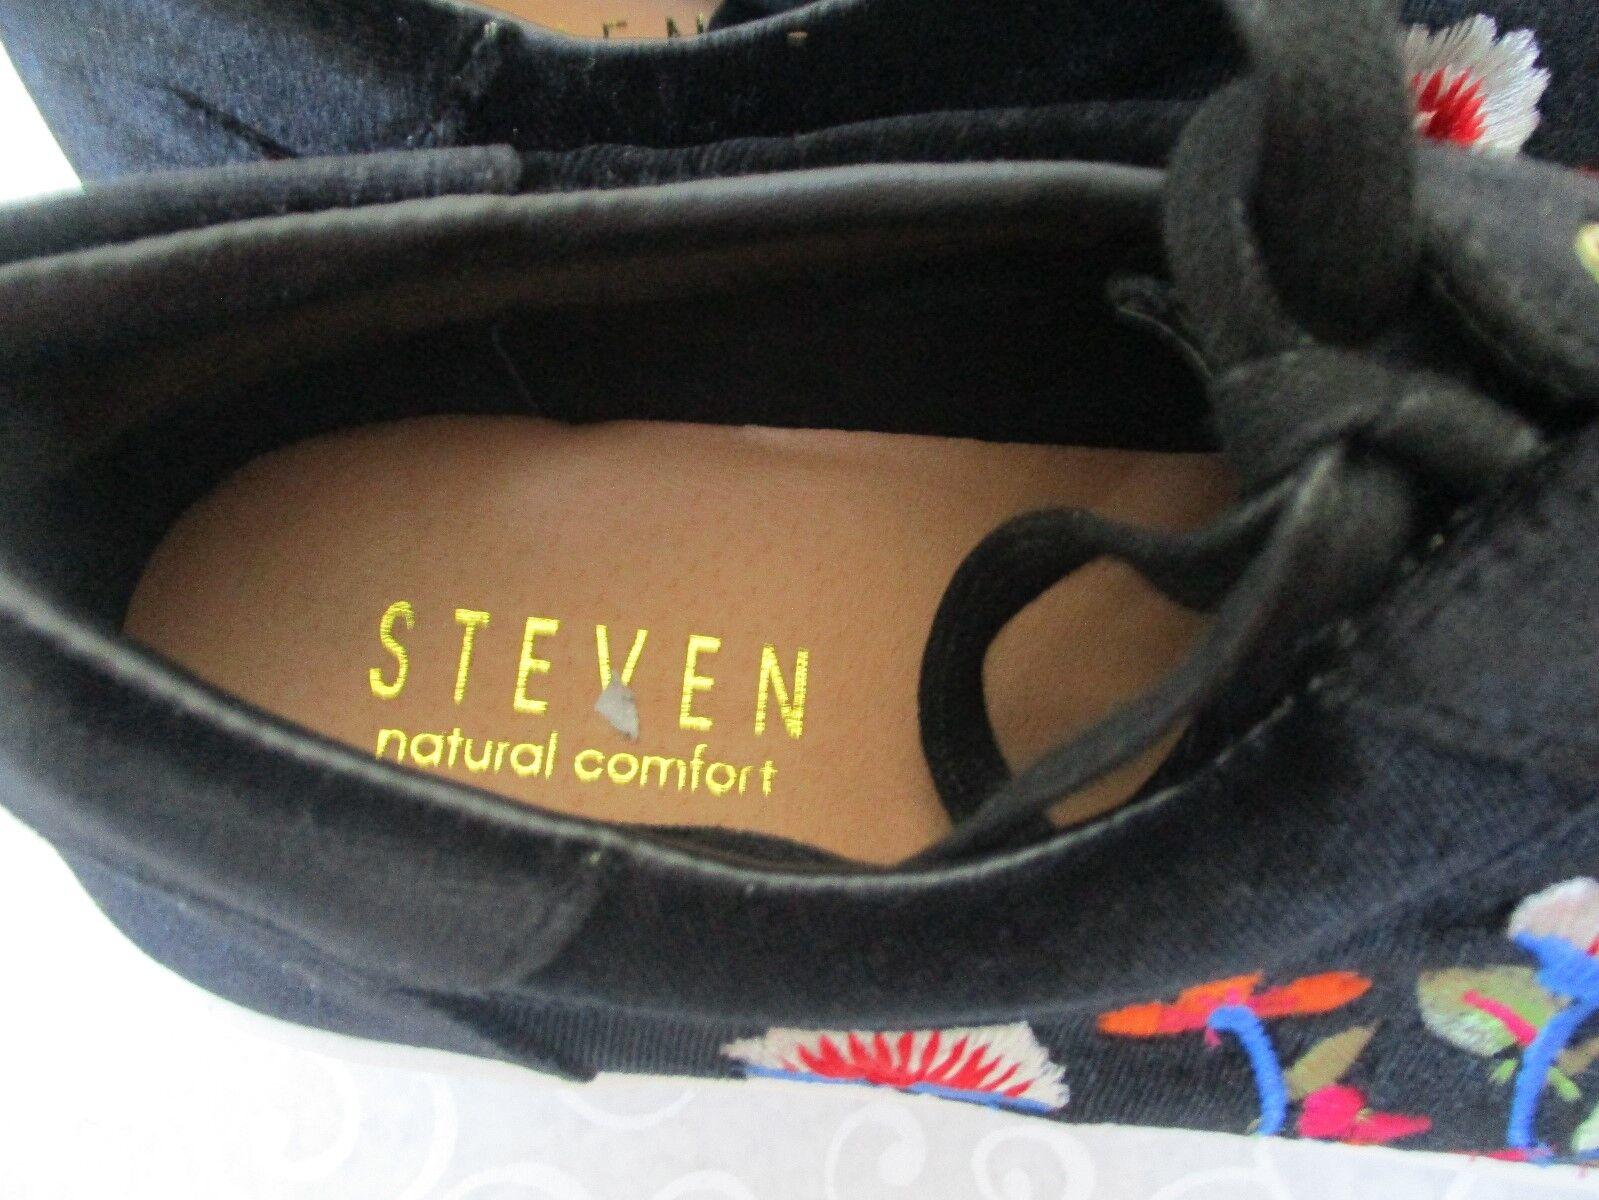 STEVNATURAL COMFORT NC NITRO BLACK EMBROIDEROT SNEAKERS Schuhe SIZE M 8 1/2 M SIZE cda7b9